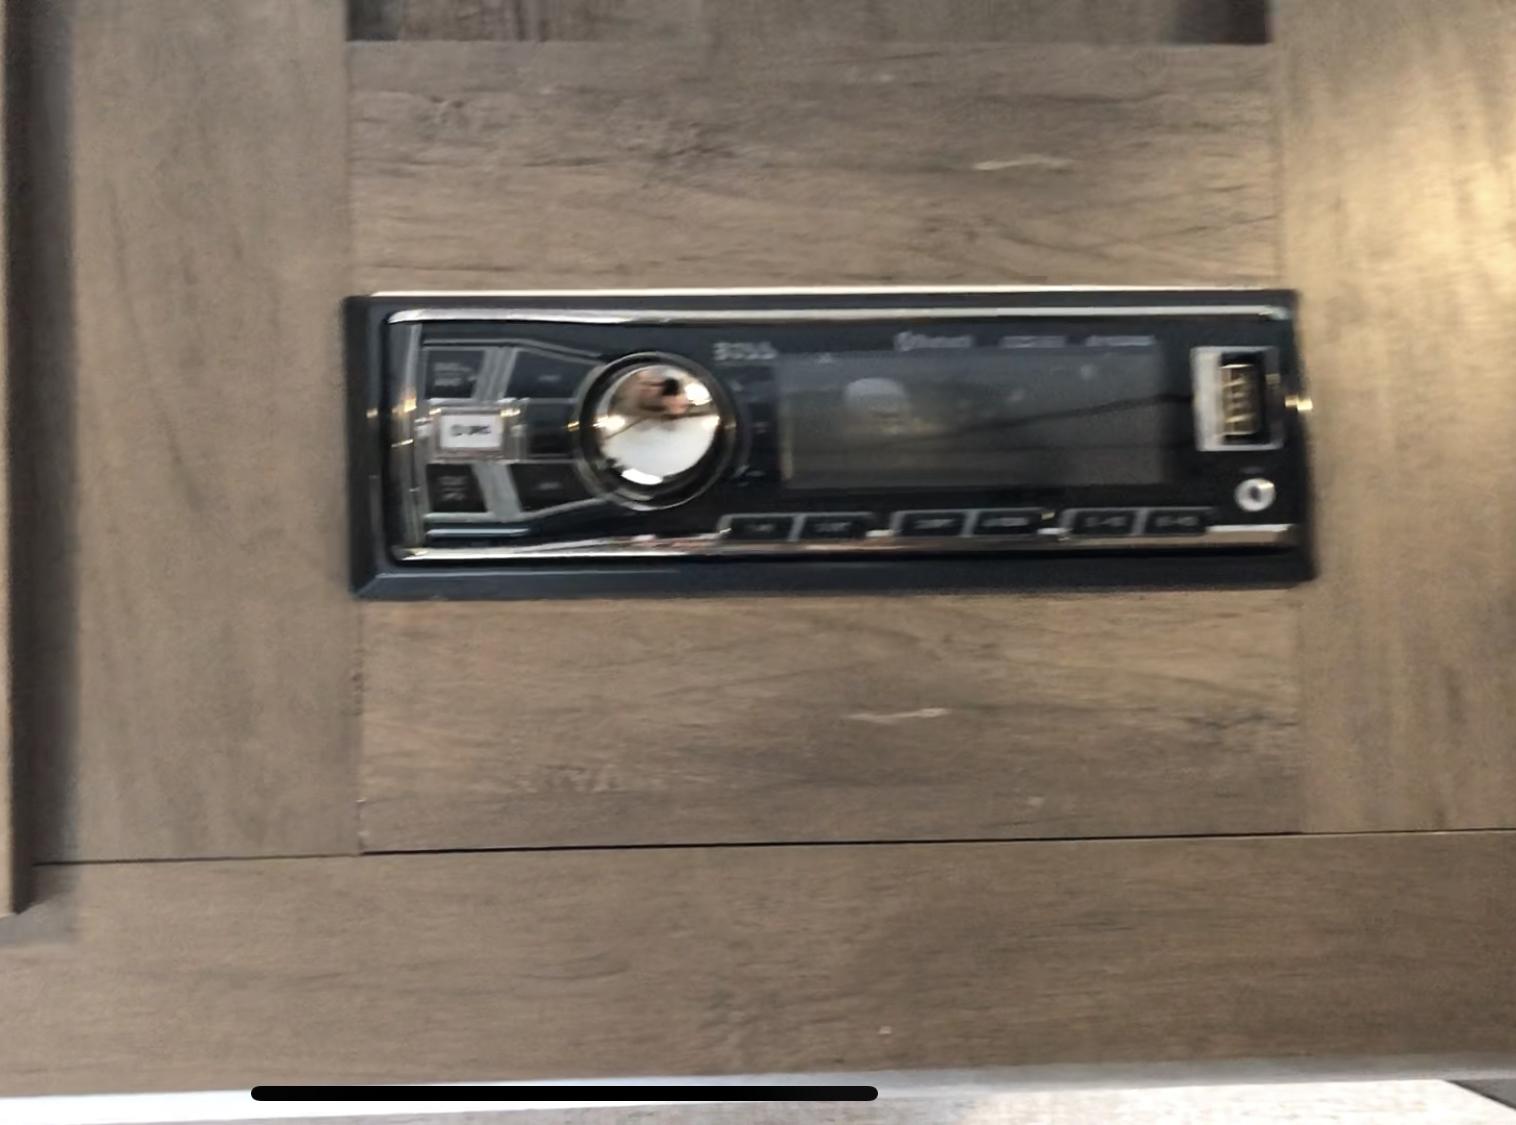 Radio/ Bluetooth speaker system. Coleman Other 2021